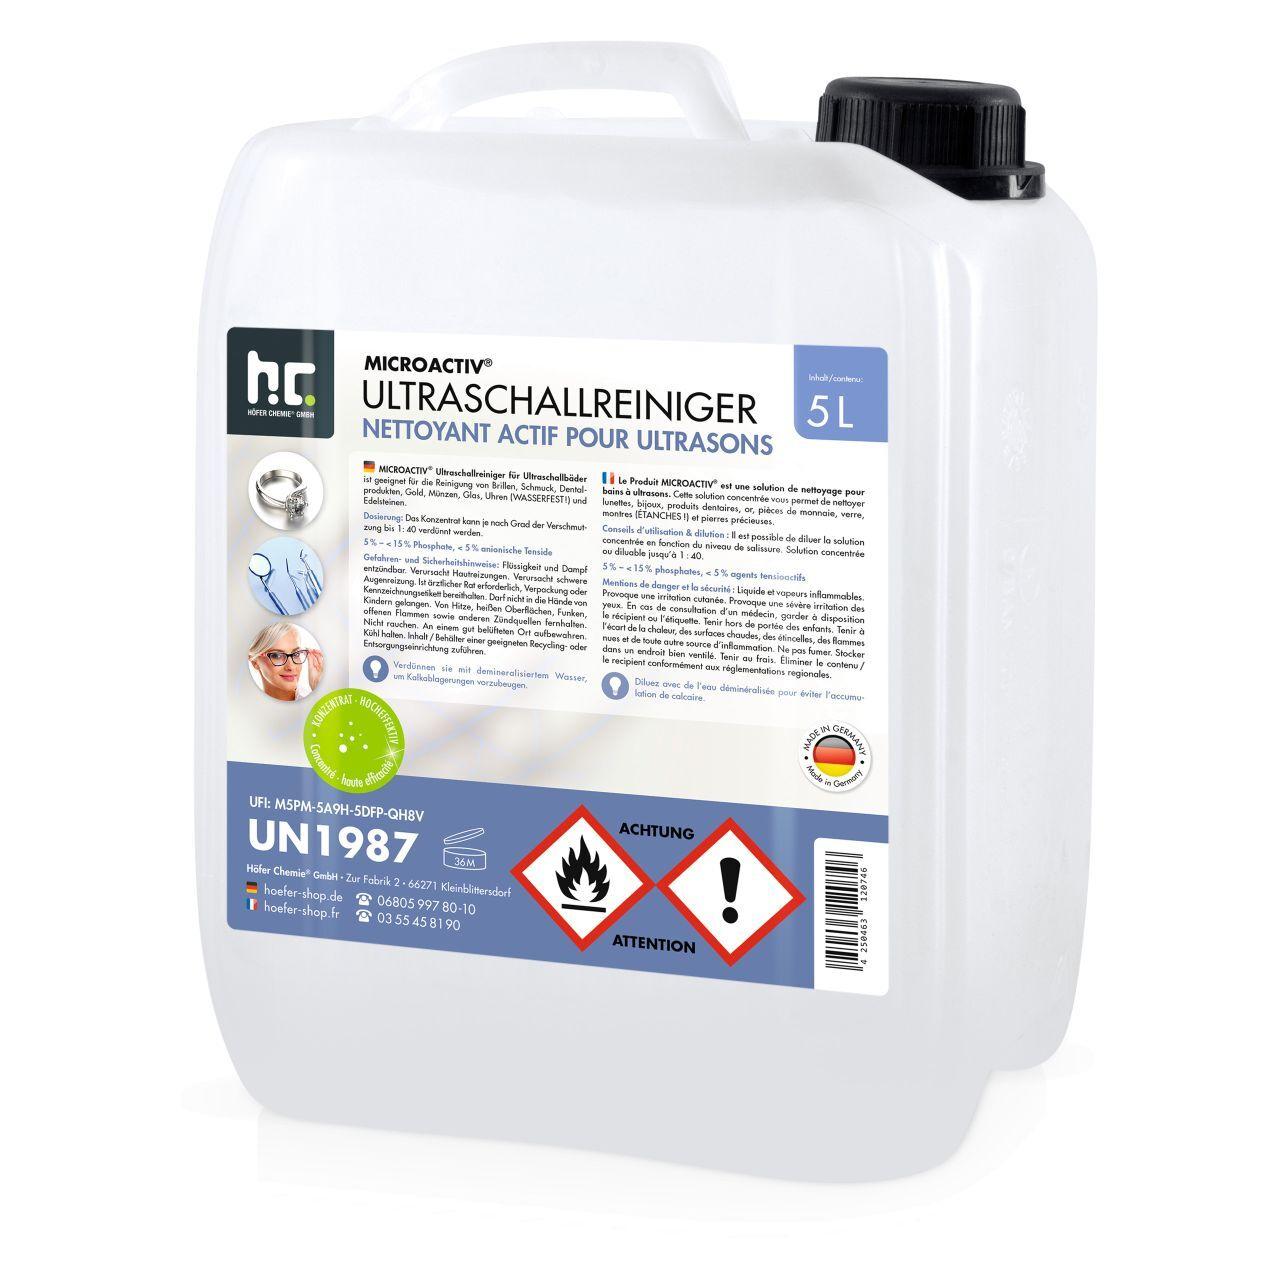 Höfer Chemie 5 l Microactiv® Produit detergent ultrason (1 x 5 l)